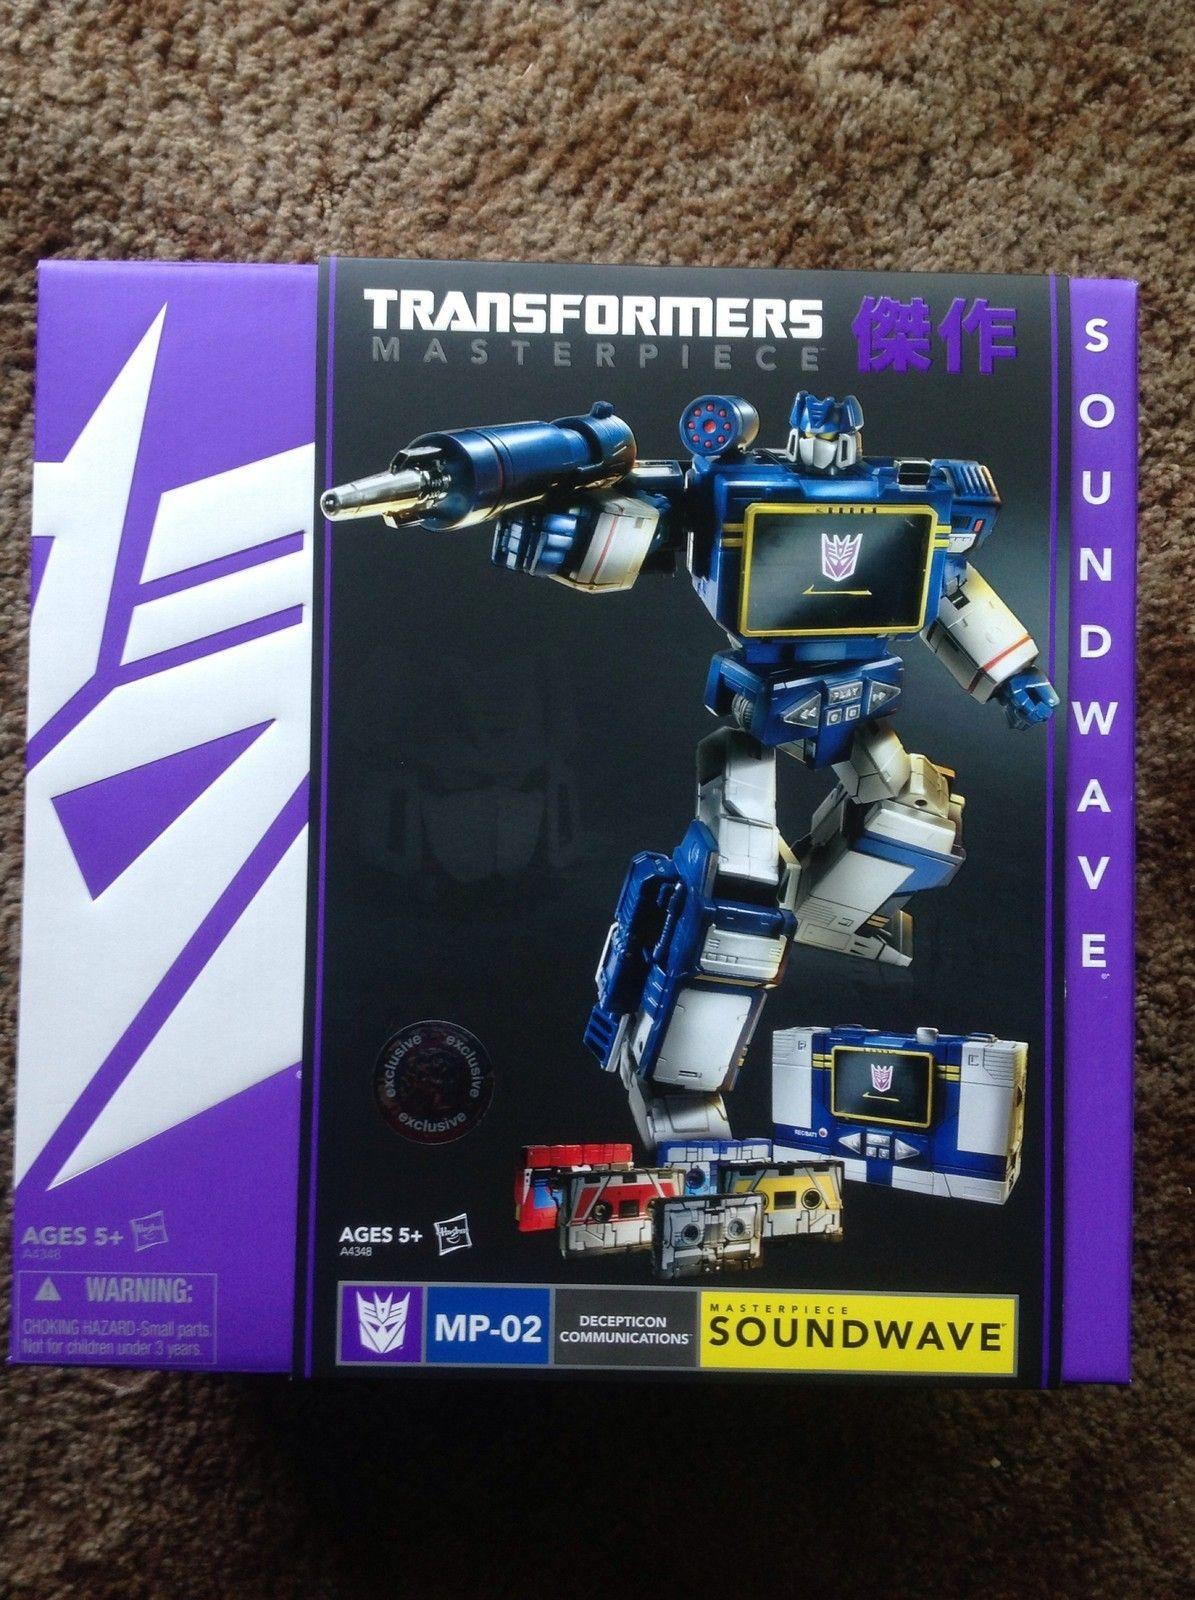 MP-02 Masterpiece Soundwave